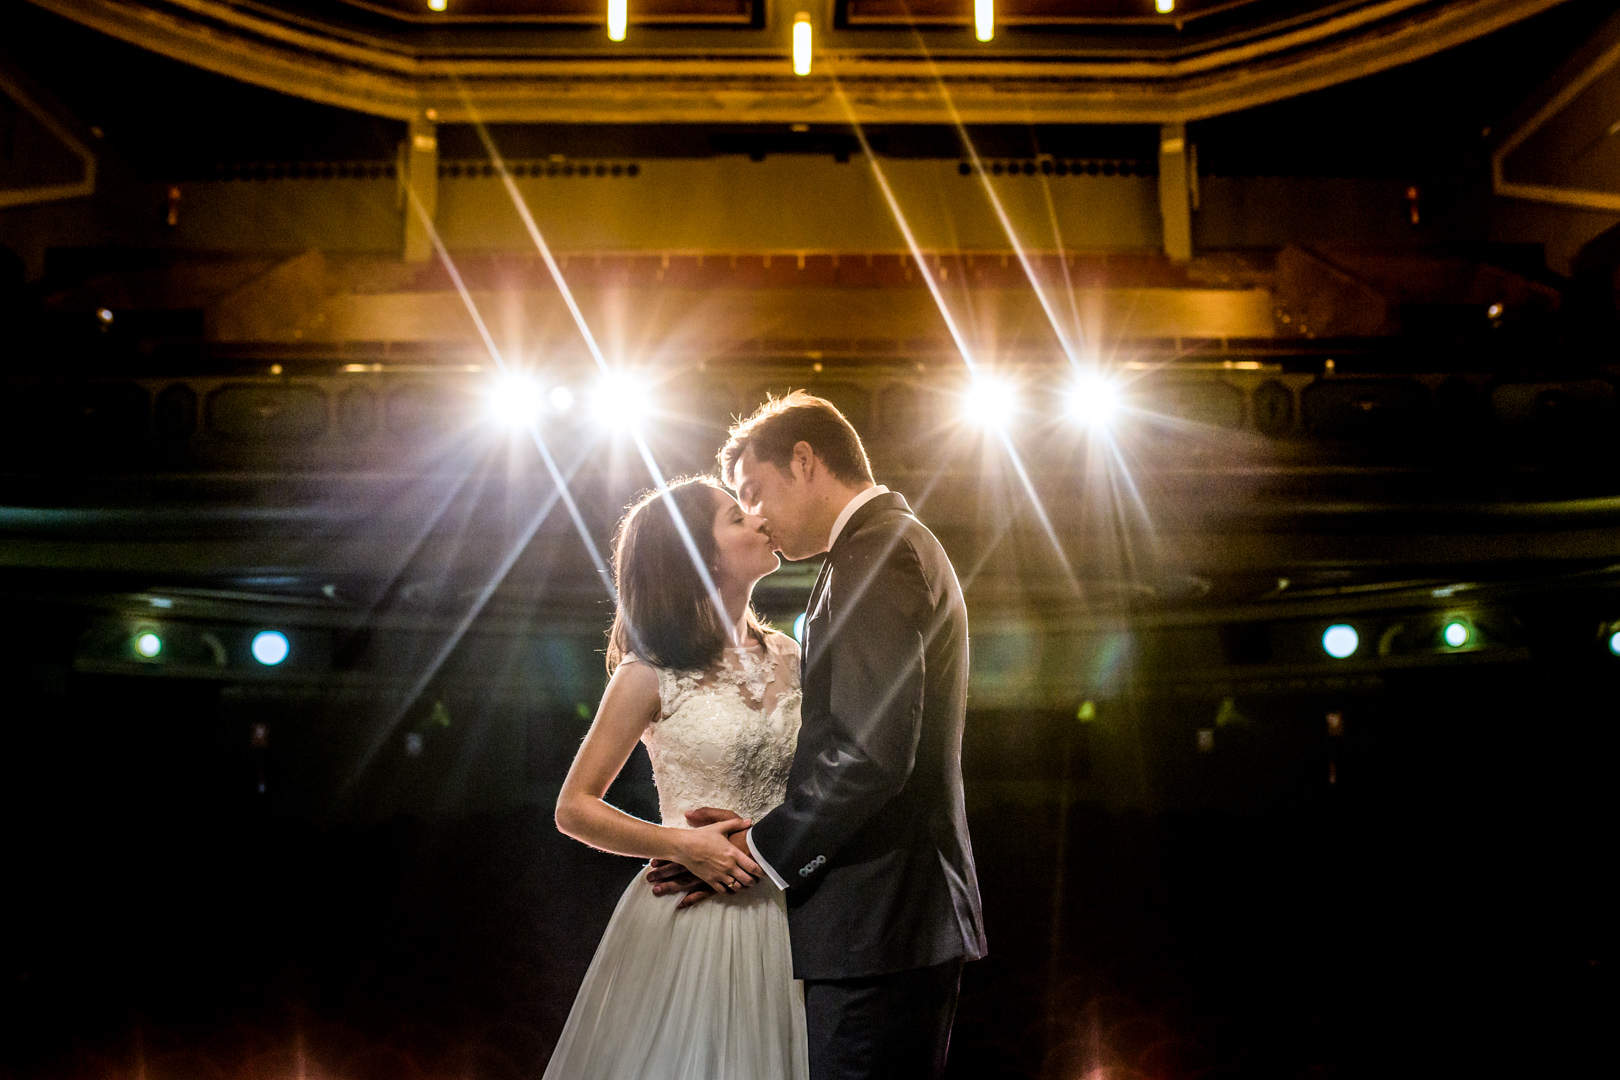 Postboda-Teatro-Cerezo-Carmona-engagement-Rafael-Torres-fotografo-bodas-sevilla-madrid-barcelona-wedding-photographer--3.jpg